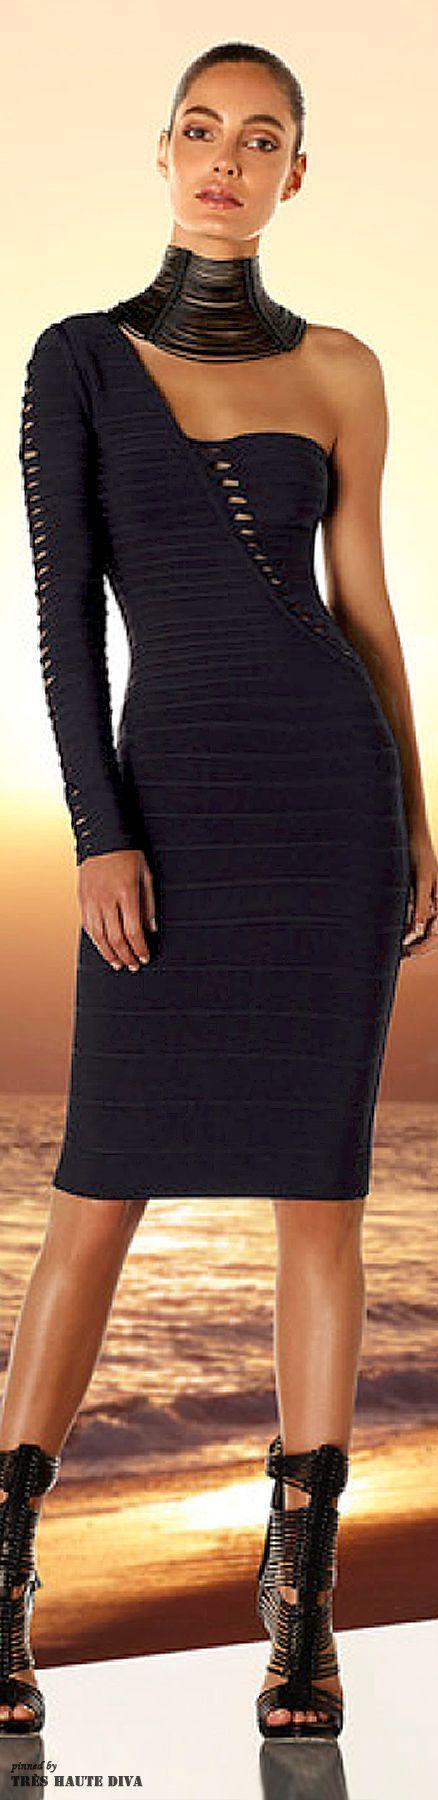 Travel Ready Resort Wear . Serafini Amelia . Hervé Léger by Max Azria Resort 2015 . Black women's fashion . Off shoulder